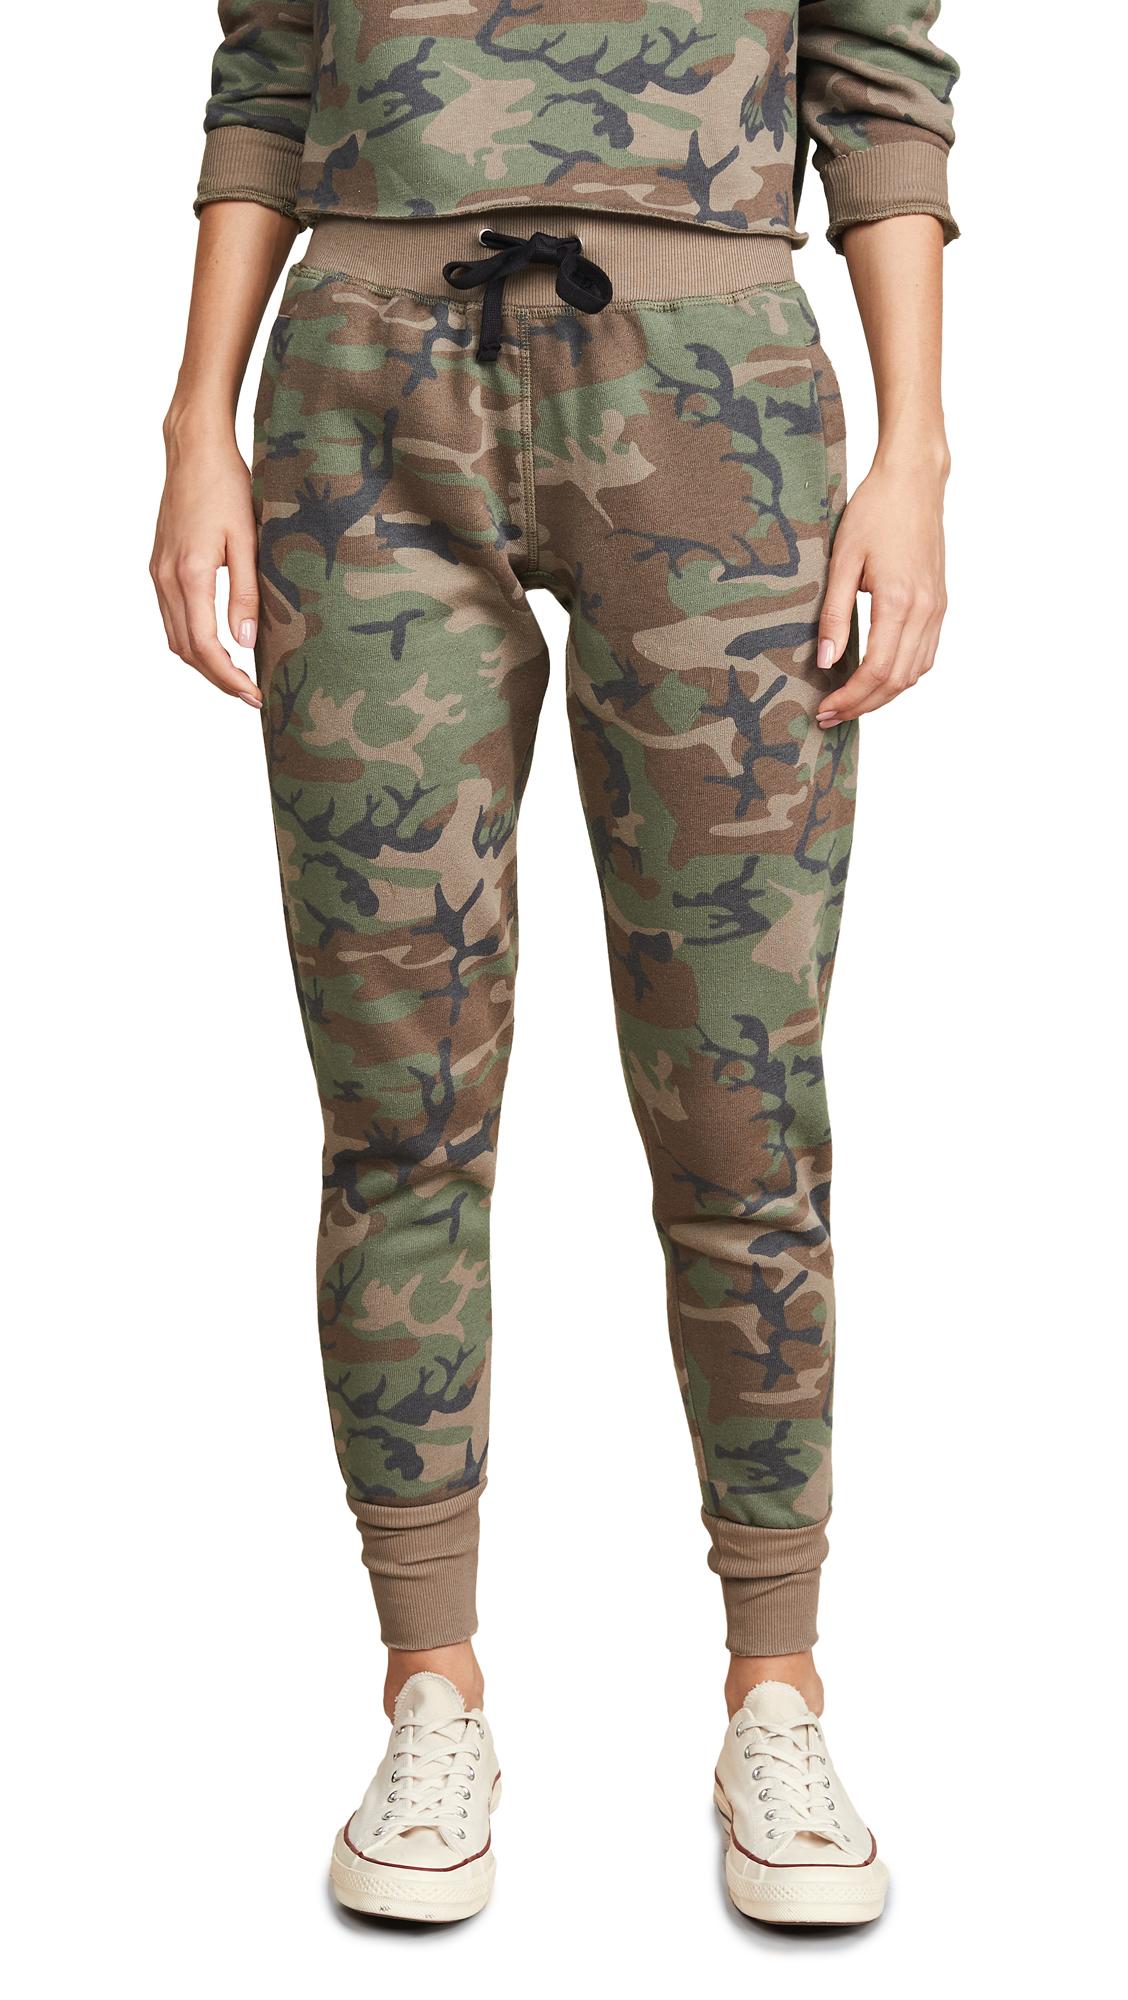 CHRLDR Camo Classic Sweatpants In Woodland Camo